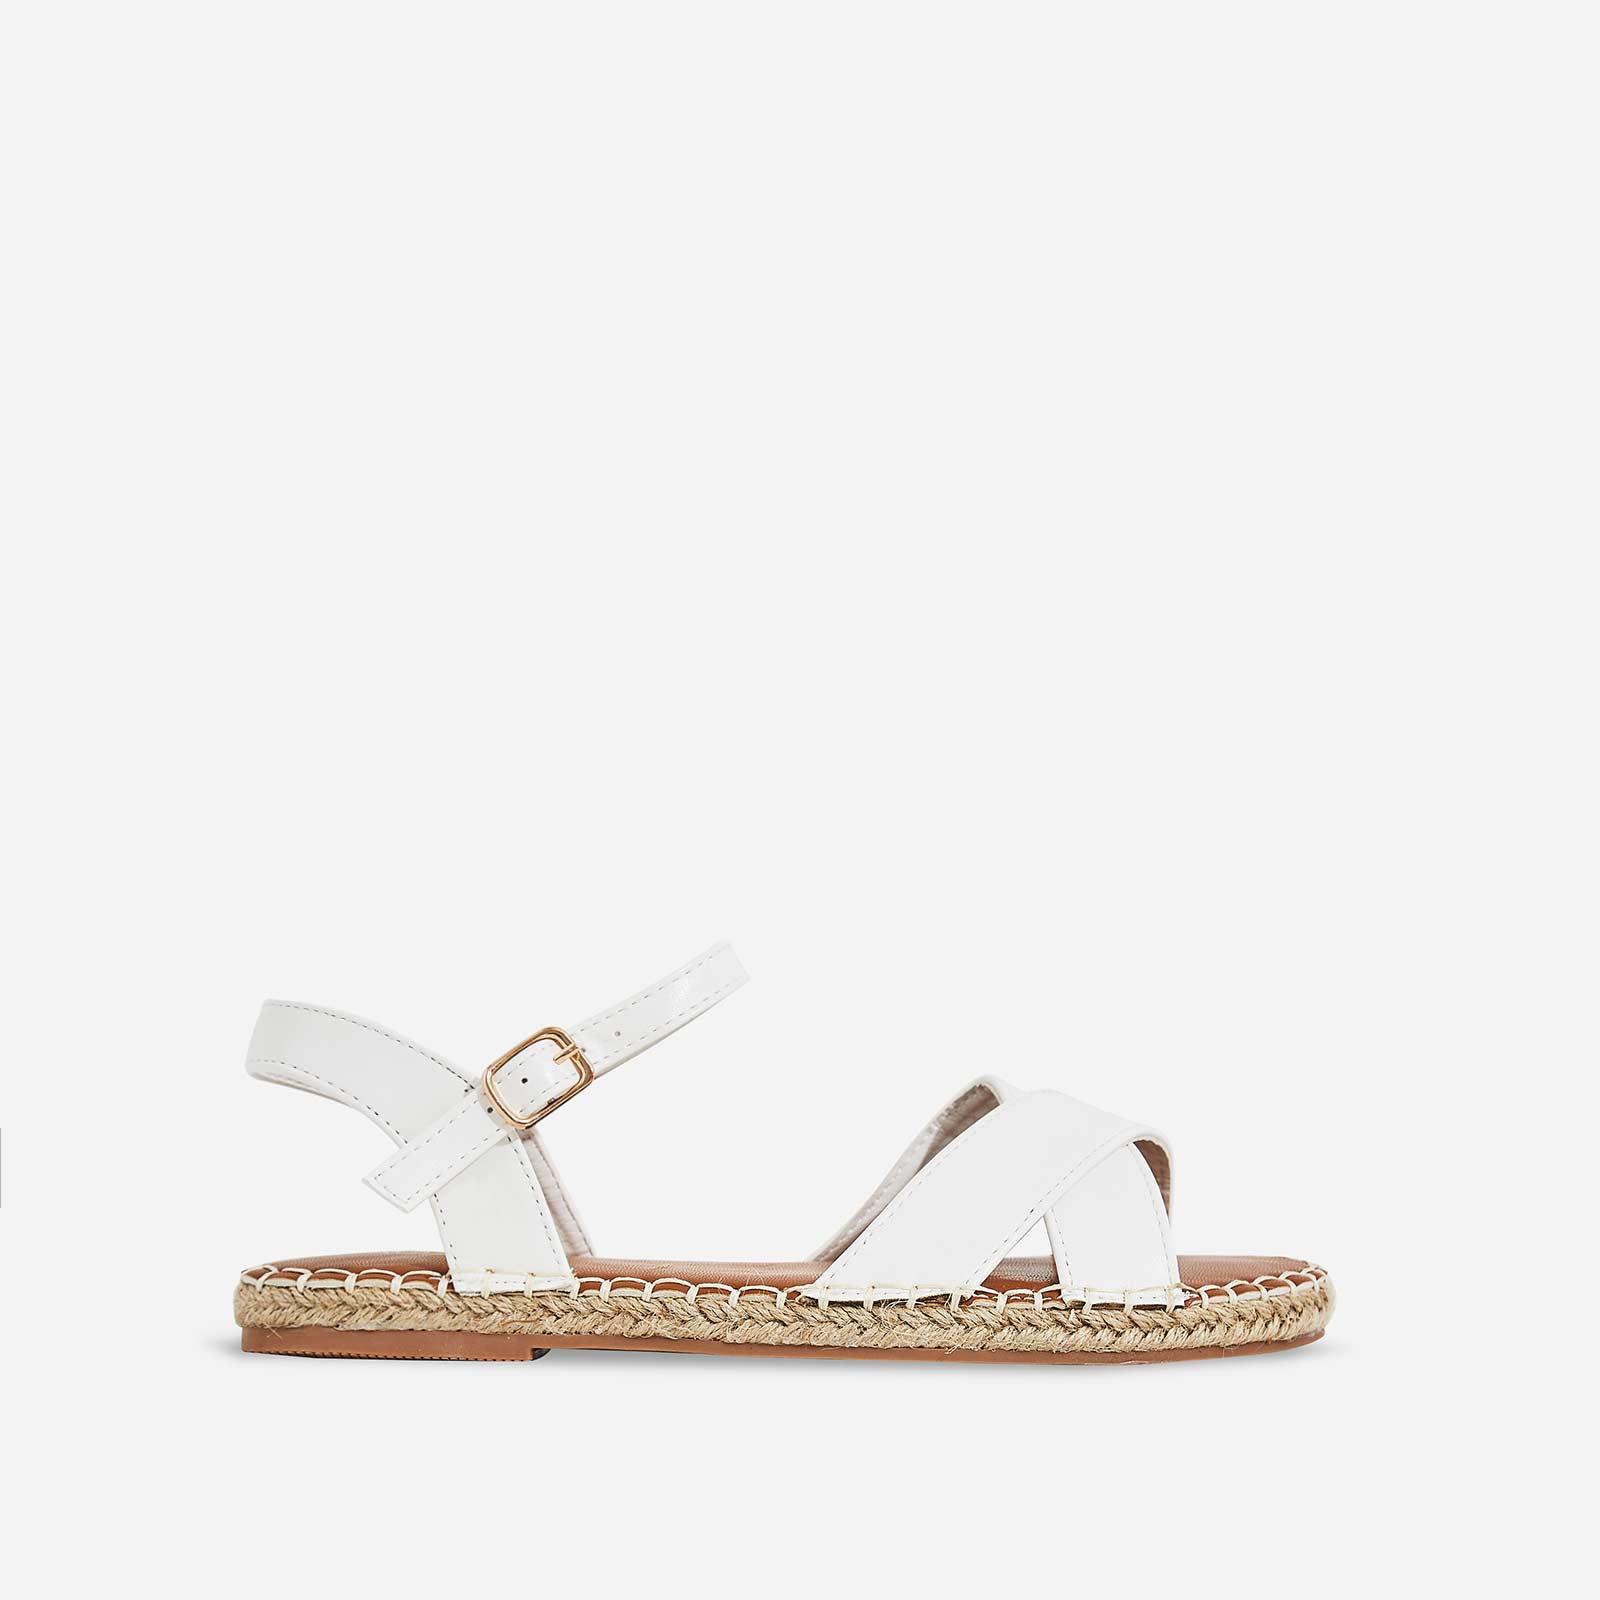 Mirren Espadrille Flat Sandal In White Faux Leather